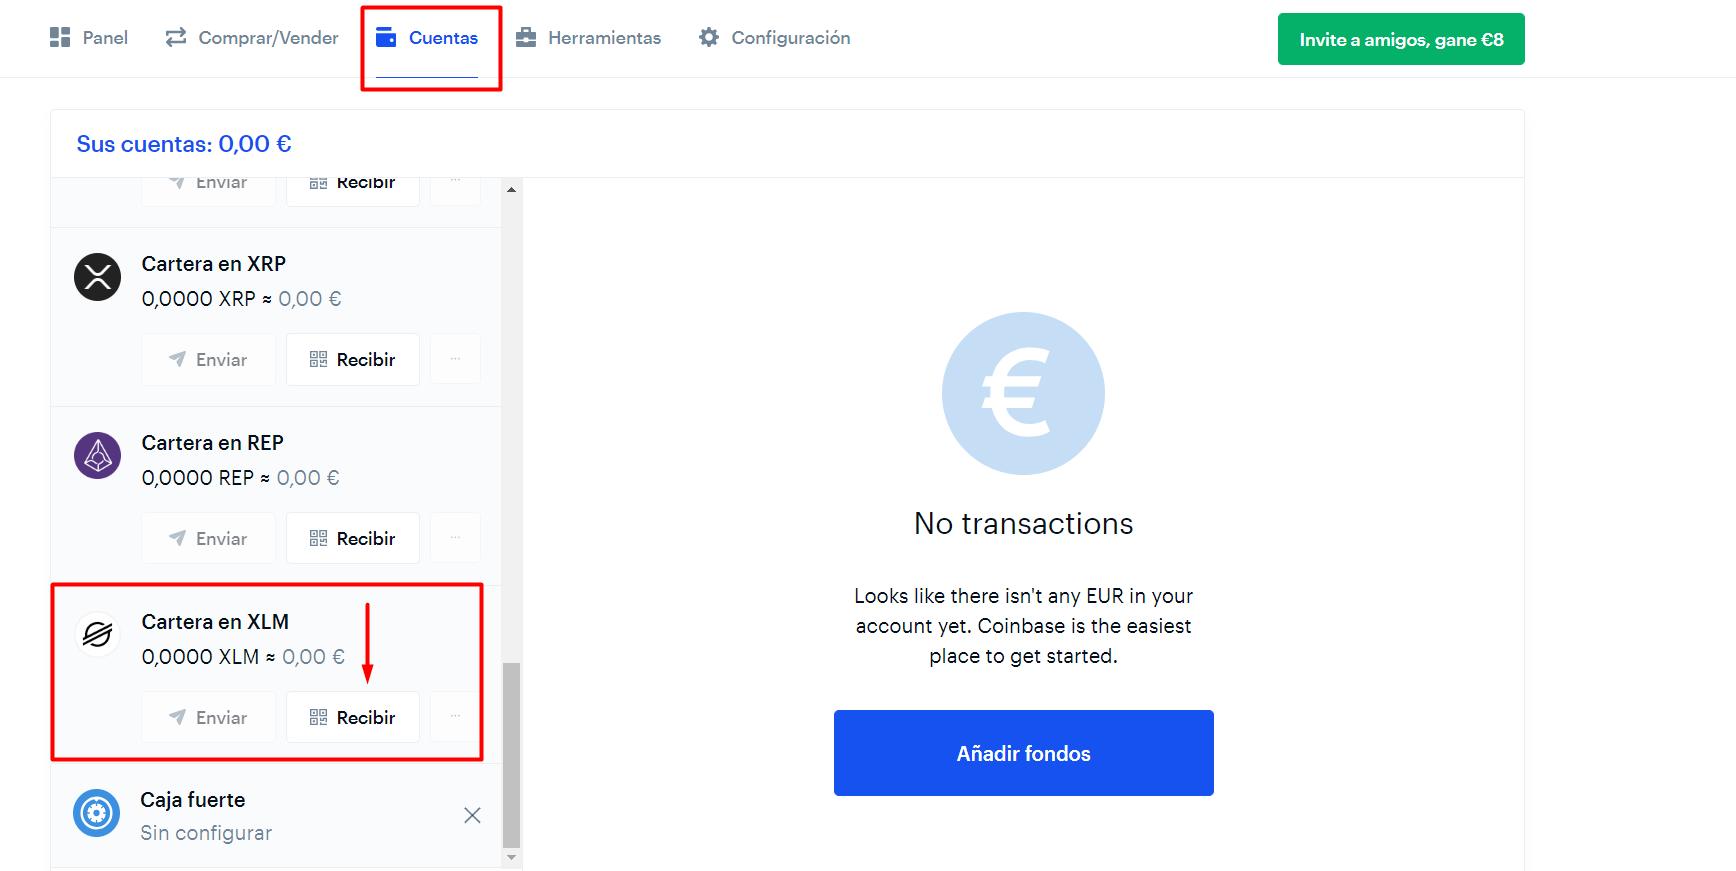 XLM Stellar Coinbase dinero gratis